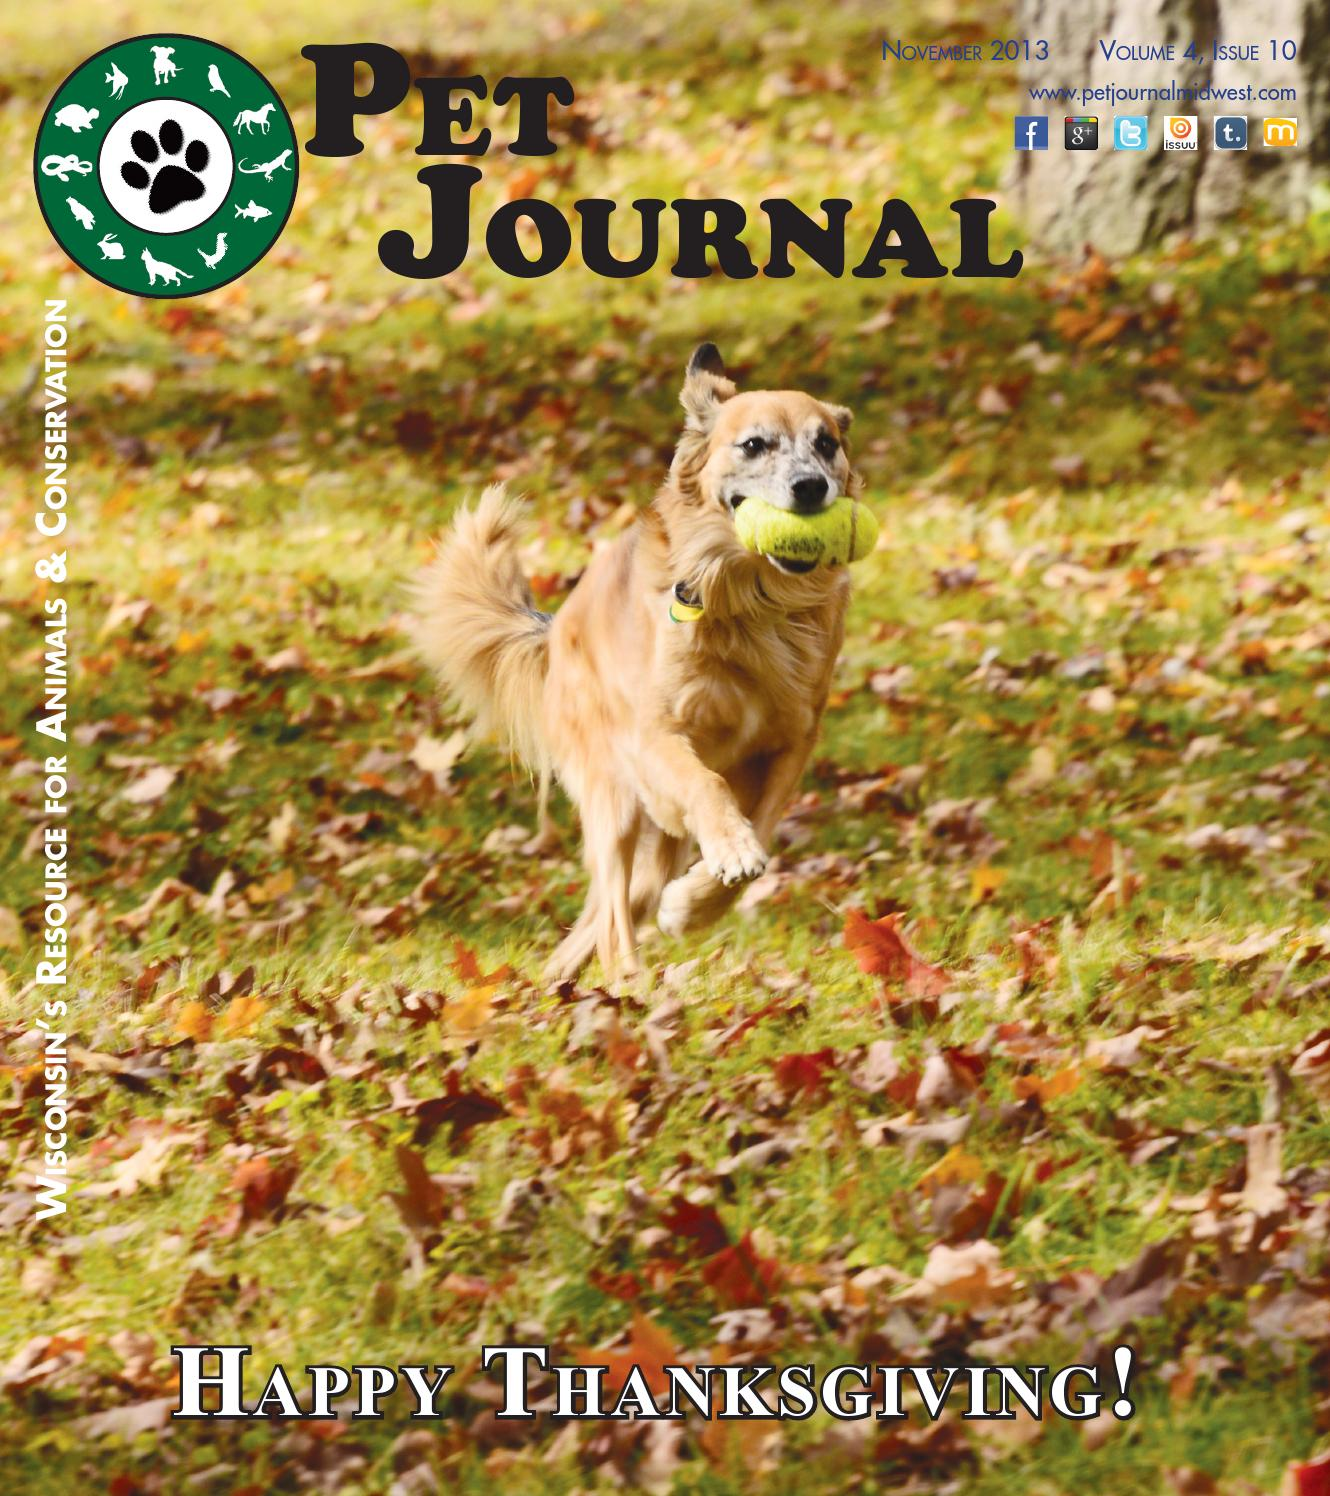 Pet Journal IV 10 November 2013 by Pet Journal issuu